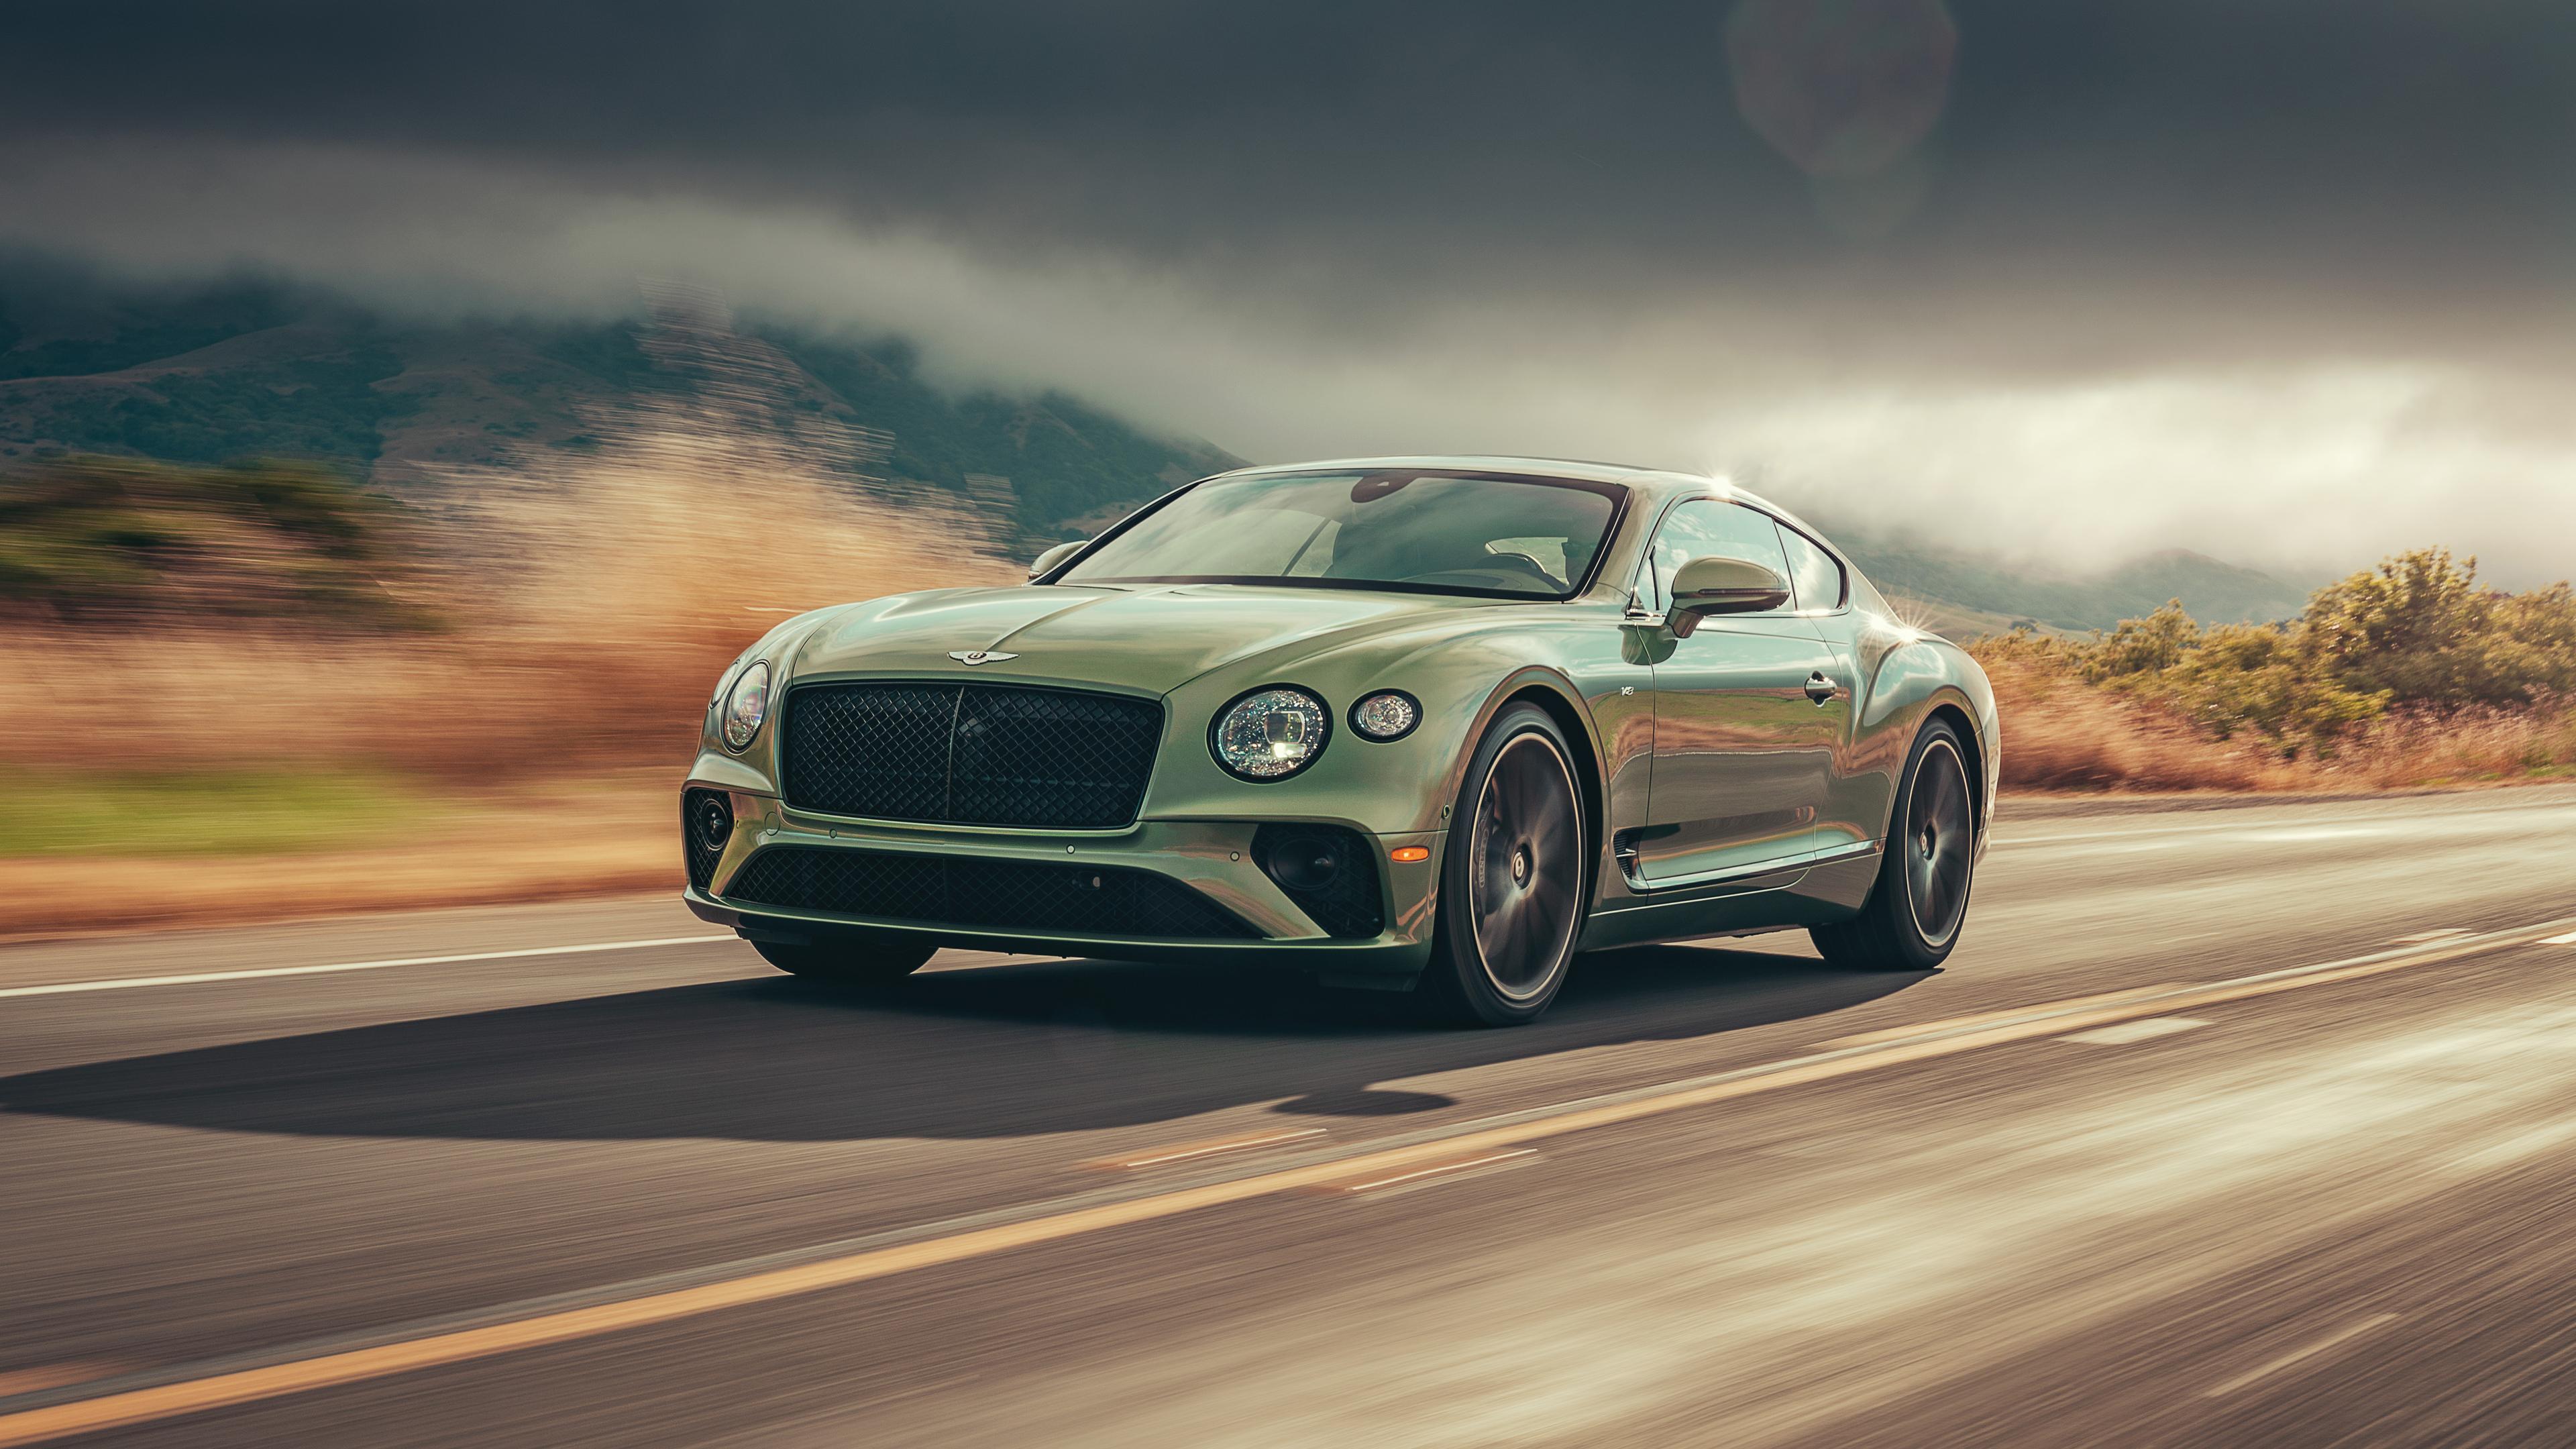 2020 bentley continental gt v8 1563221053 - 2020 Bentley Continental GT V8 - hd-wallpapers, bentley wallpapers, bentley continental wallpapers, bentley continental gt3 wallpapers, 5k wallpapers, 4k-wallpapers, 2020 cars wallpapers